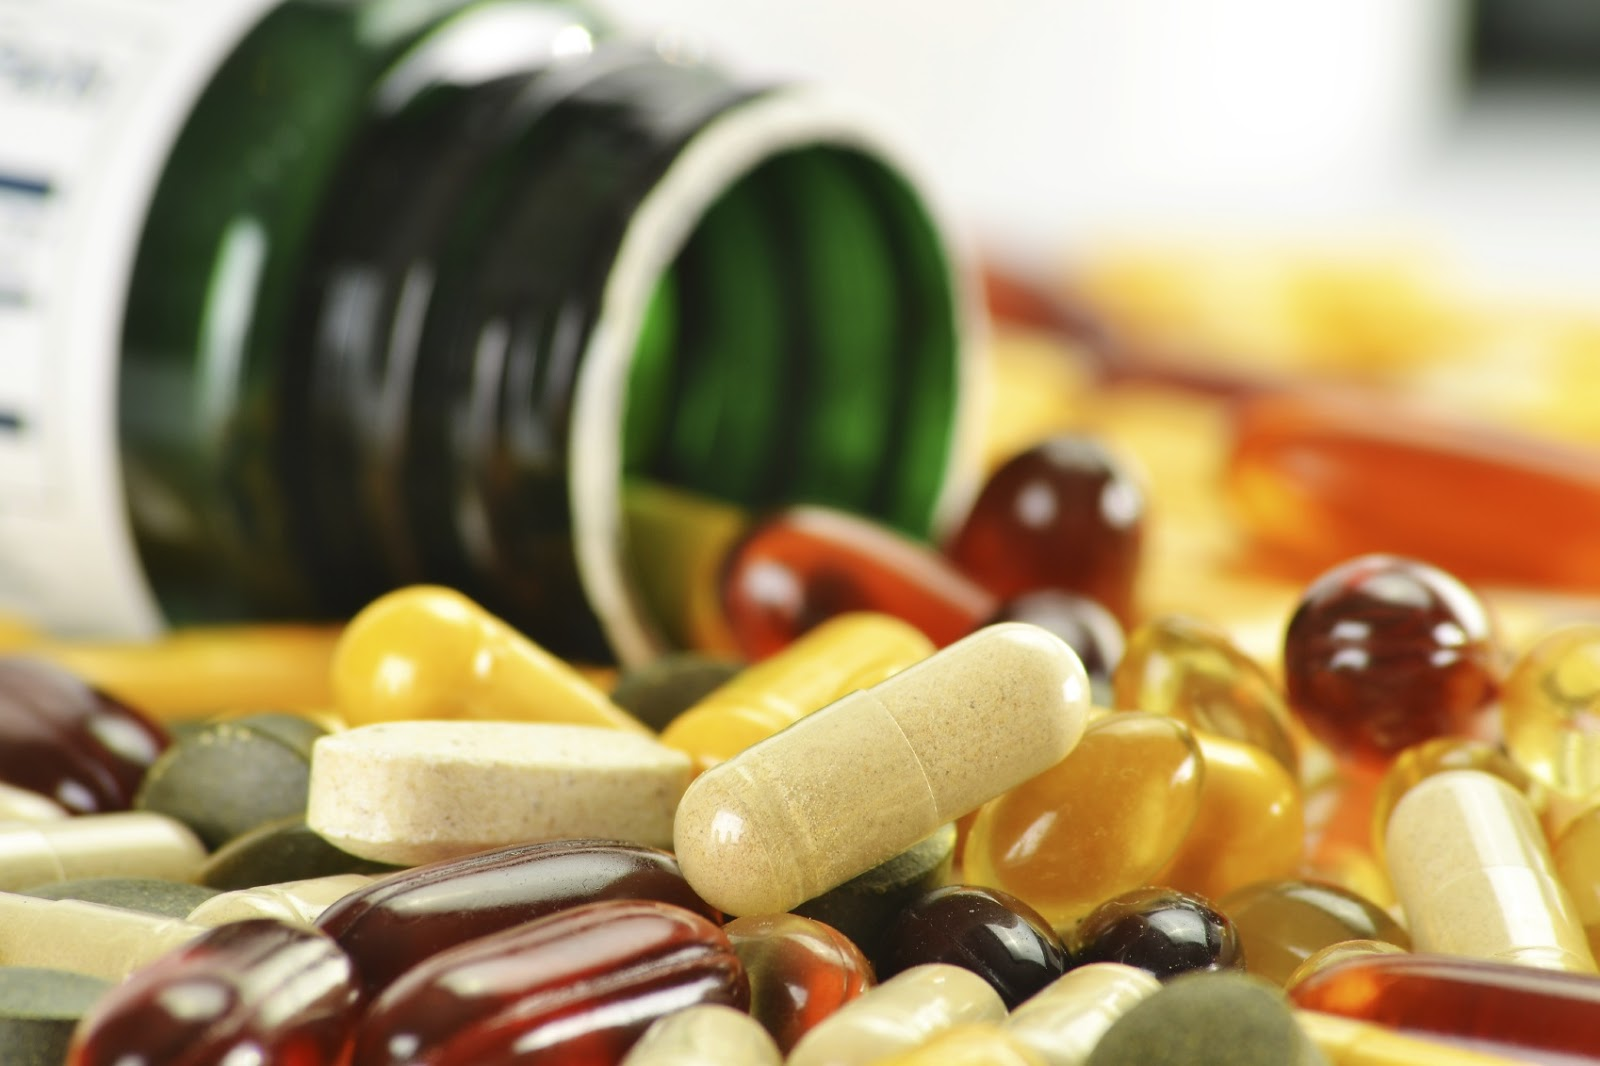 Resultado de imagem para vitamins supplements